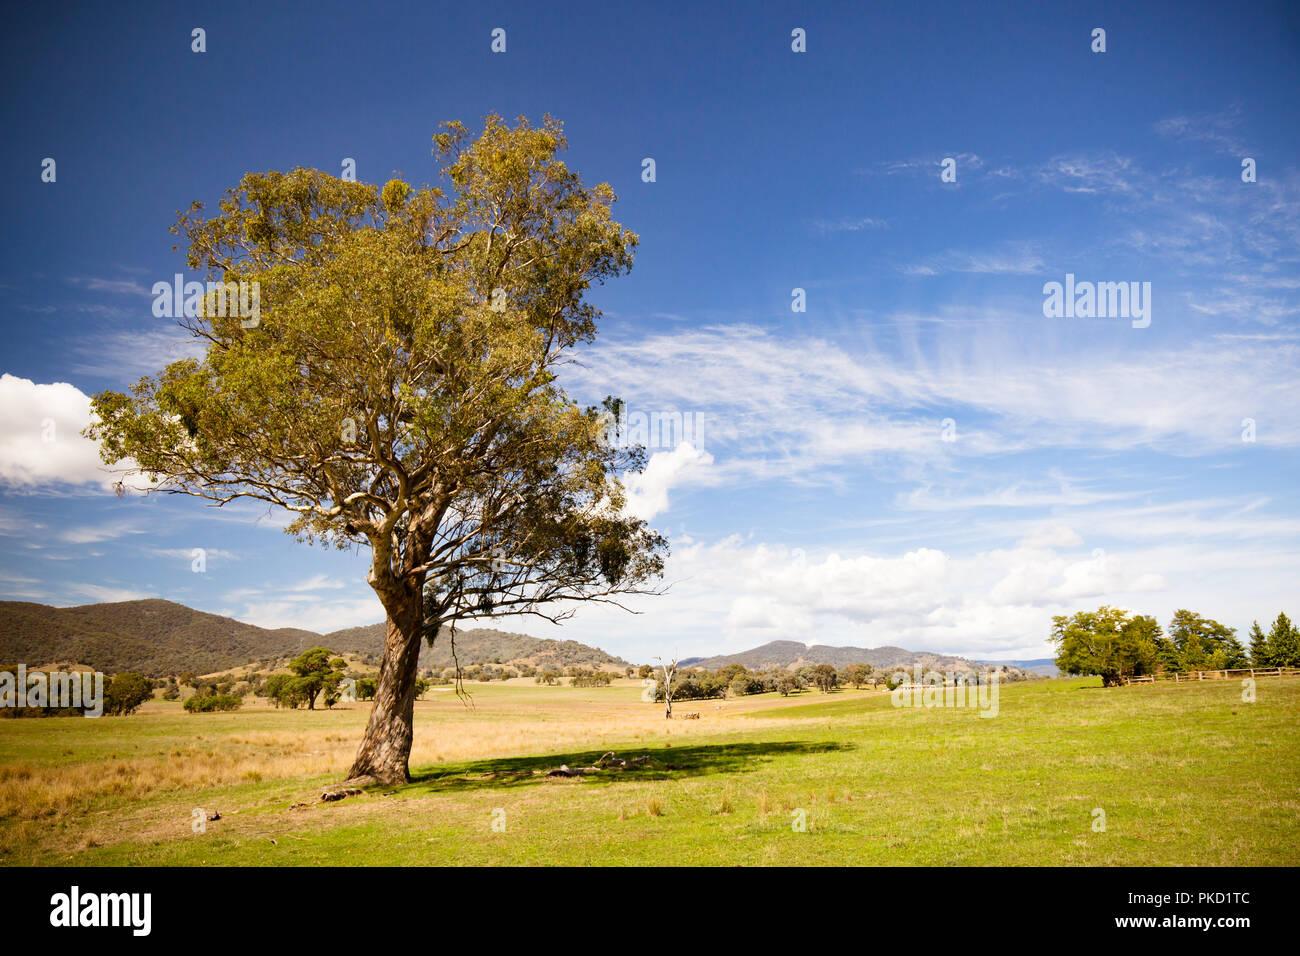 Allans flache Landschaft Australien Stockbild